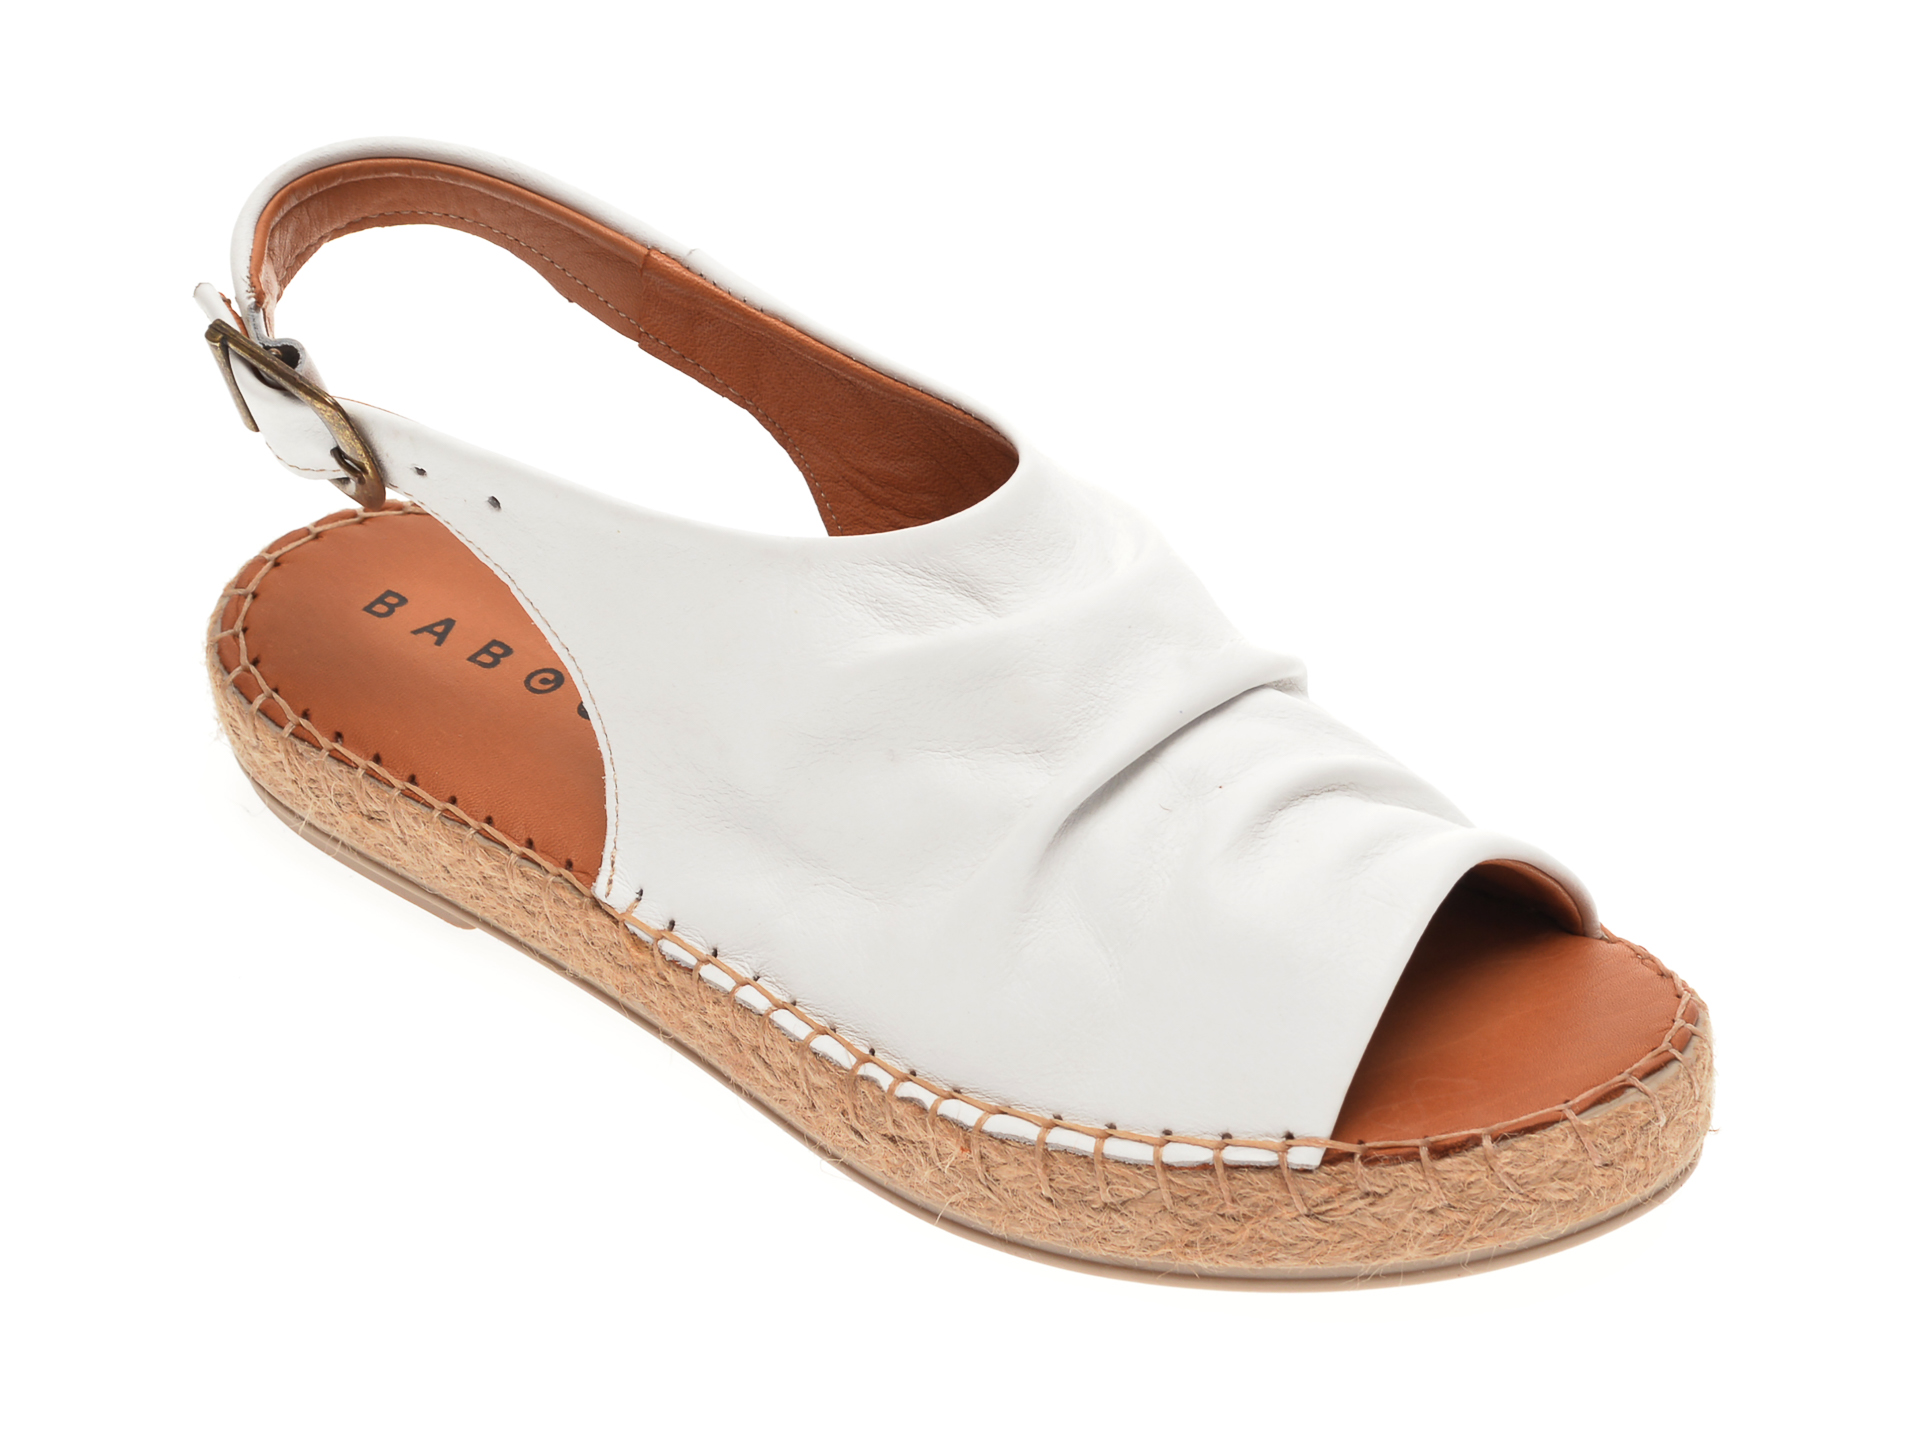 Sandale BABOOS albe, R06, din piele naturala